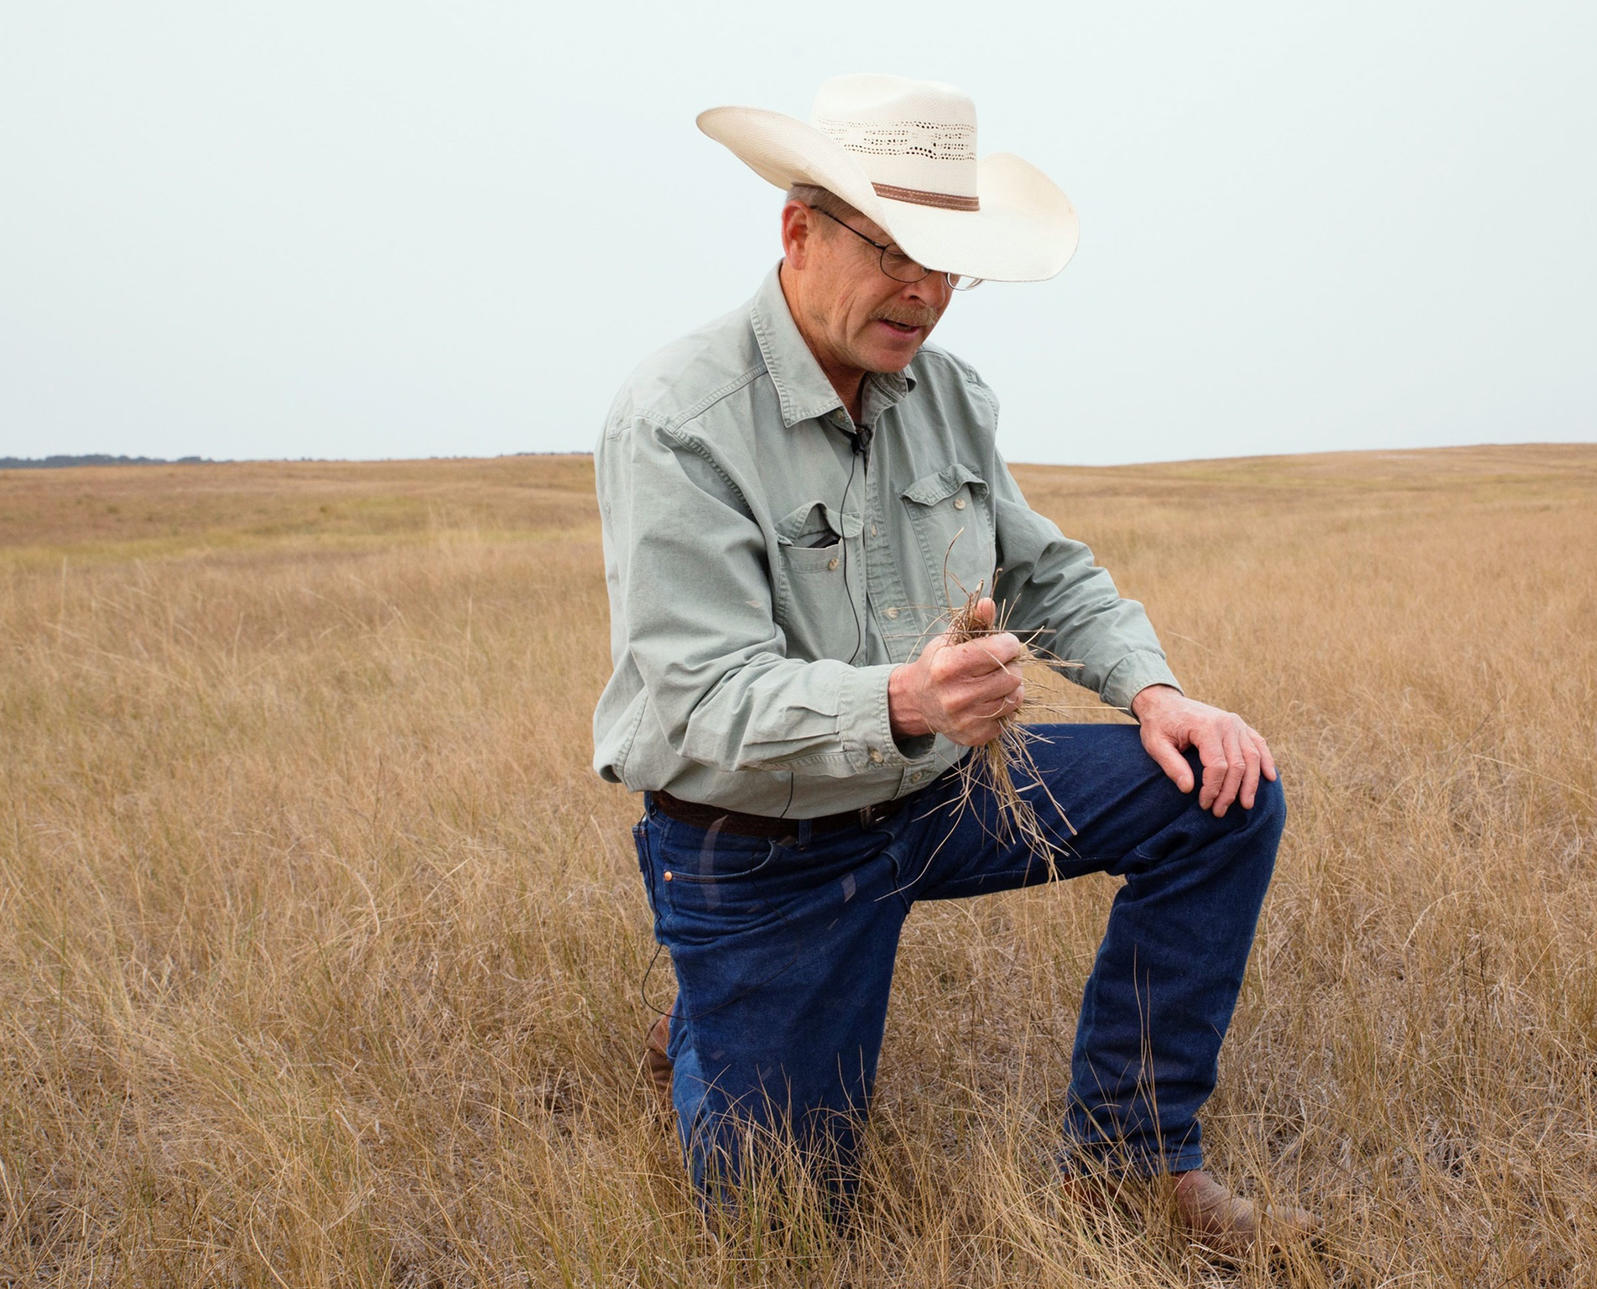 Dan Rasmussen, 33 Ranch, South Dakota, 22,000 acres enrolled in the Audubon Conservation Ranching Initiative. Mike Fernandez/Audubon